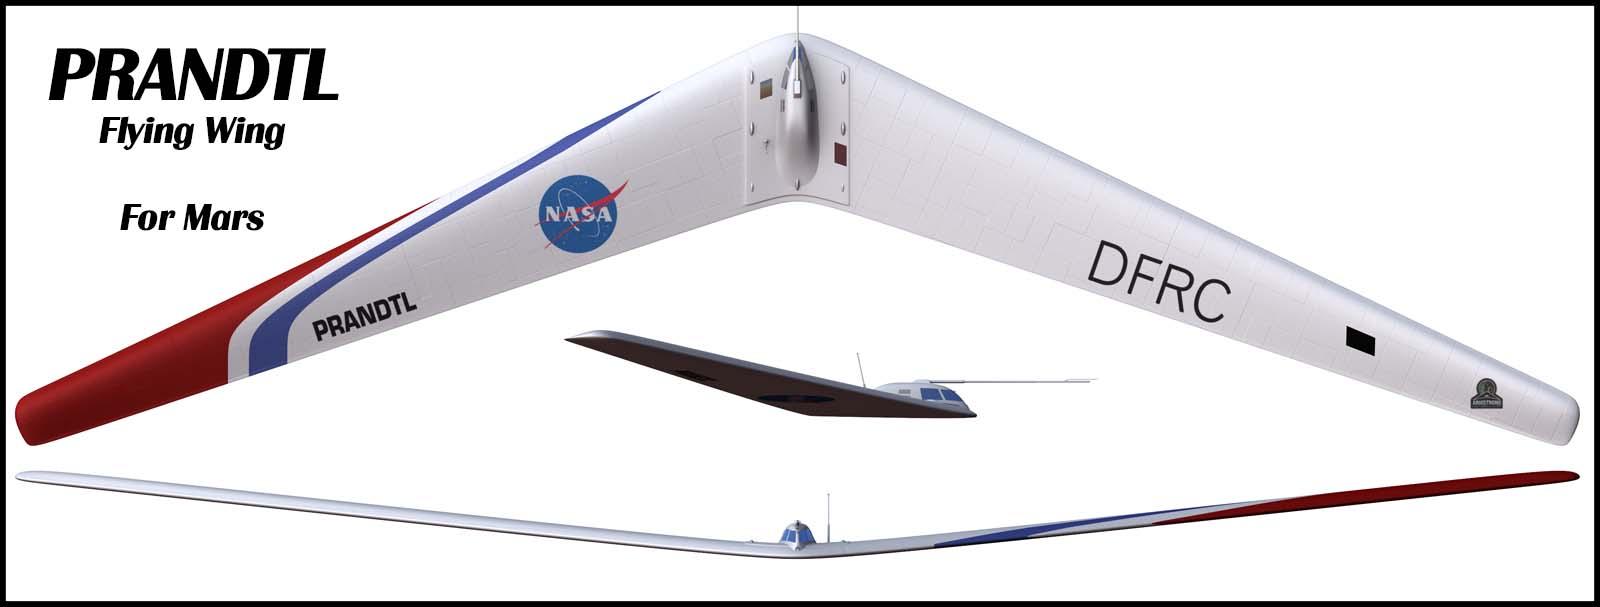 Nasa Prandtl Flying Wing For Mars Nick Stevens